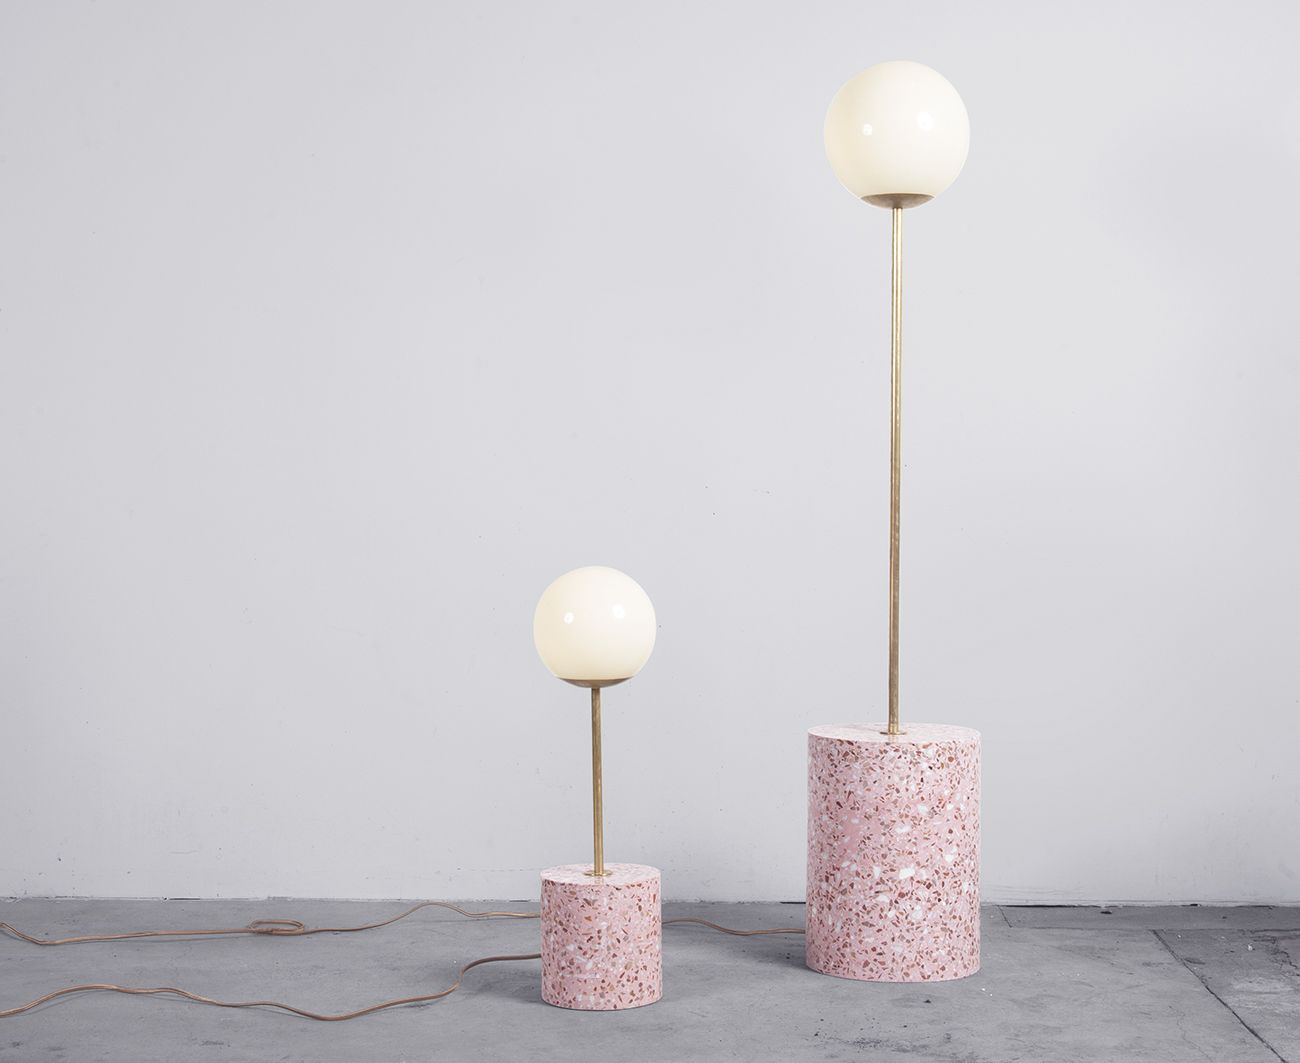 Symbols Snakes And Spirituality In A New Collection Of Terrazzo Furniture Minimalistische Dekoration Deko Ideen Und Terrazzo